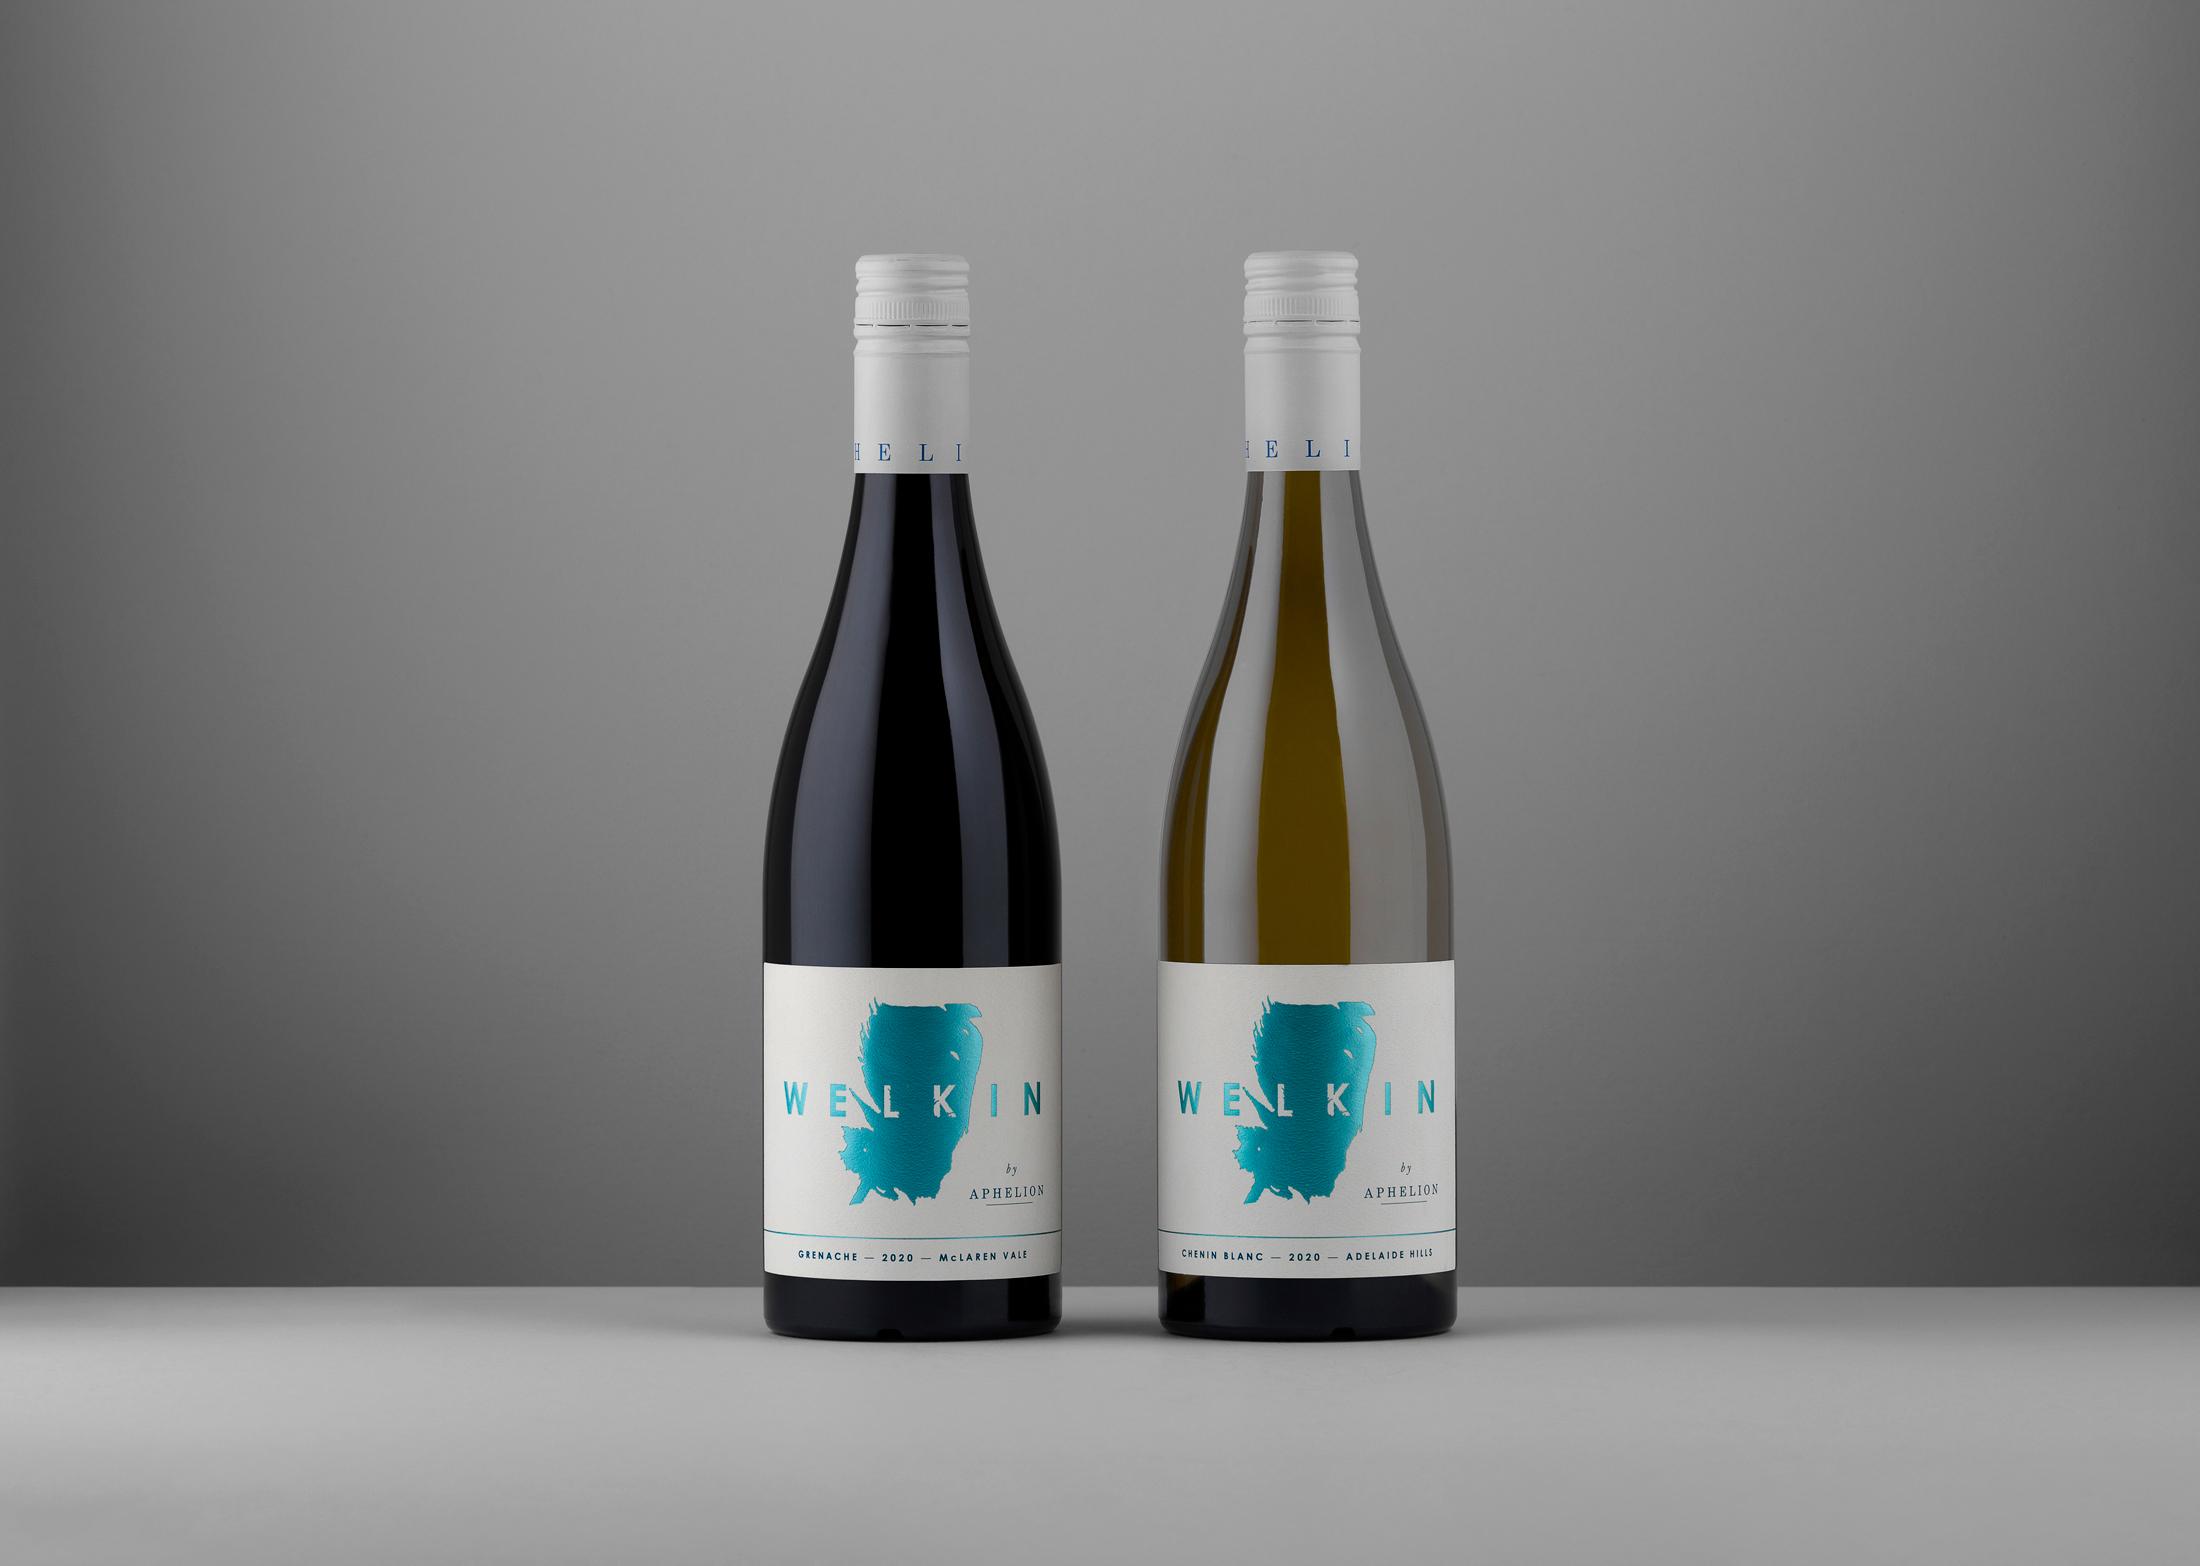 Aphelion Wine 'Welkin Series' Designed by David Byerlee Design